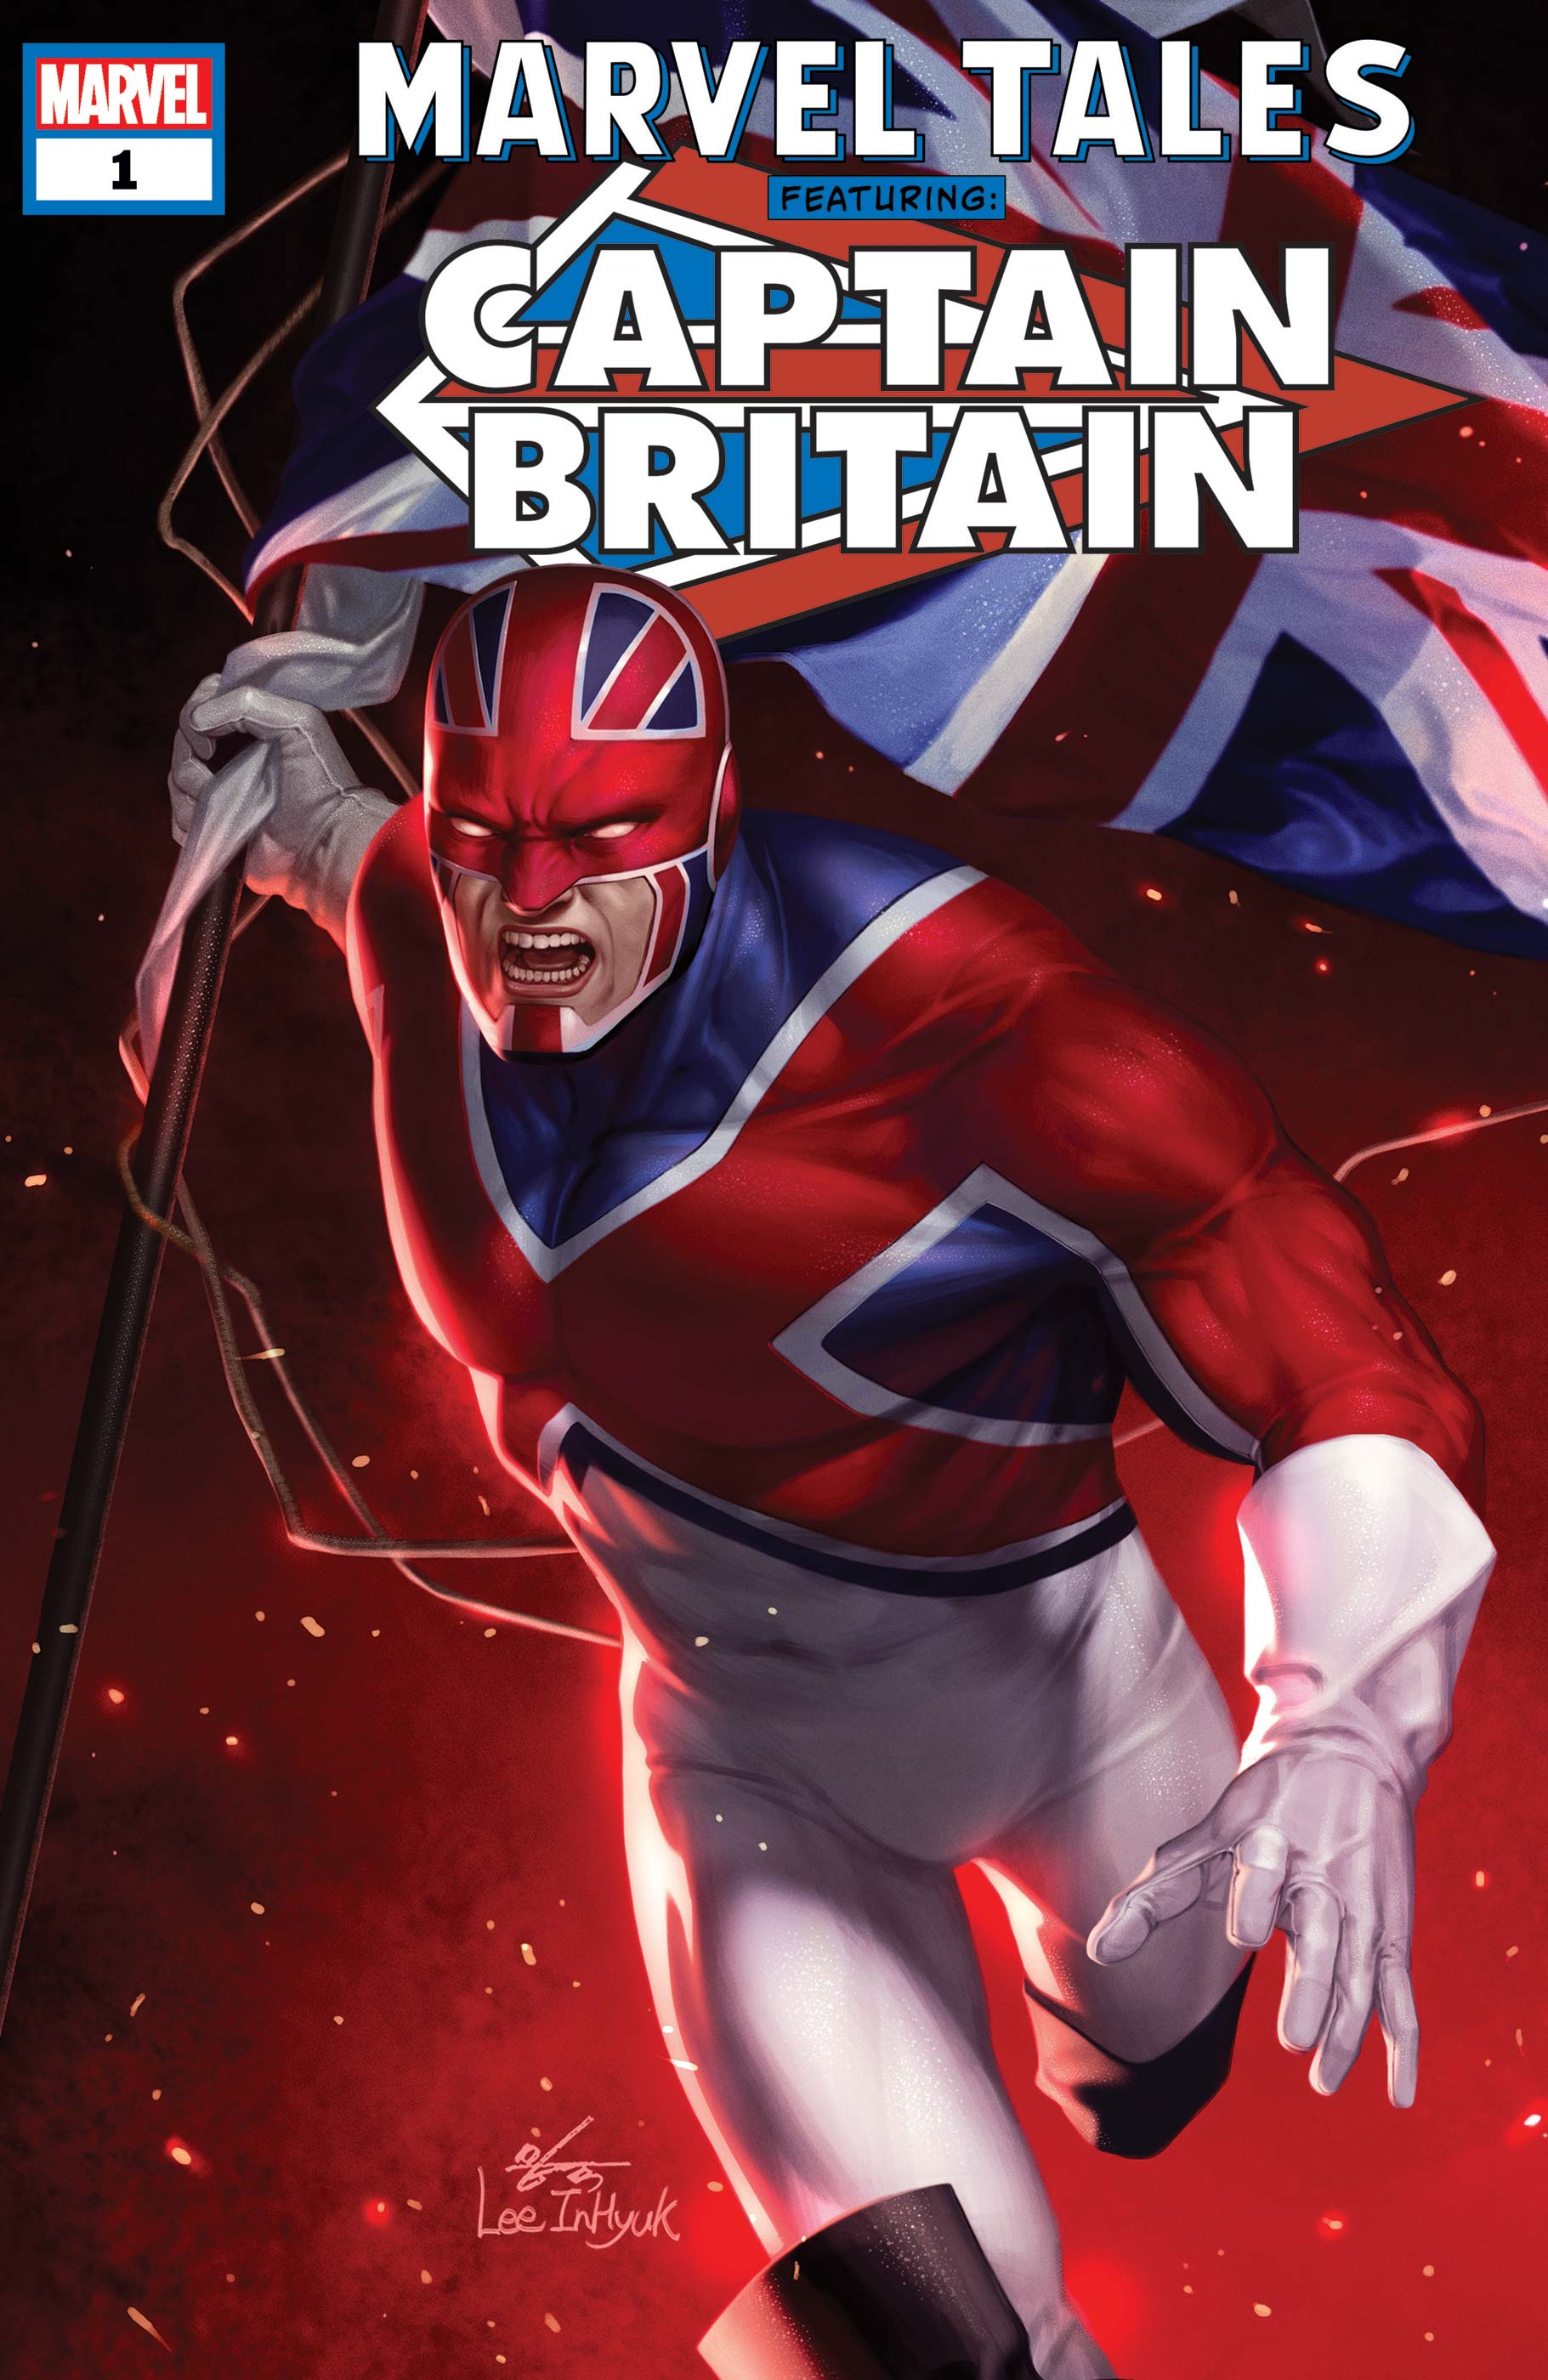 Marvel Tales: Captain Britain (2020) #1